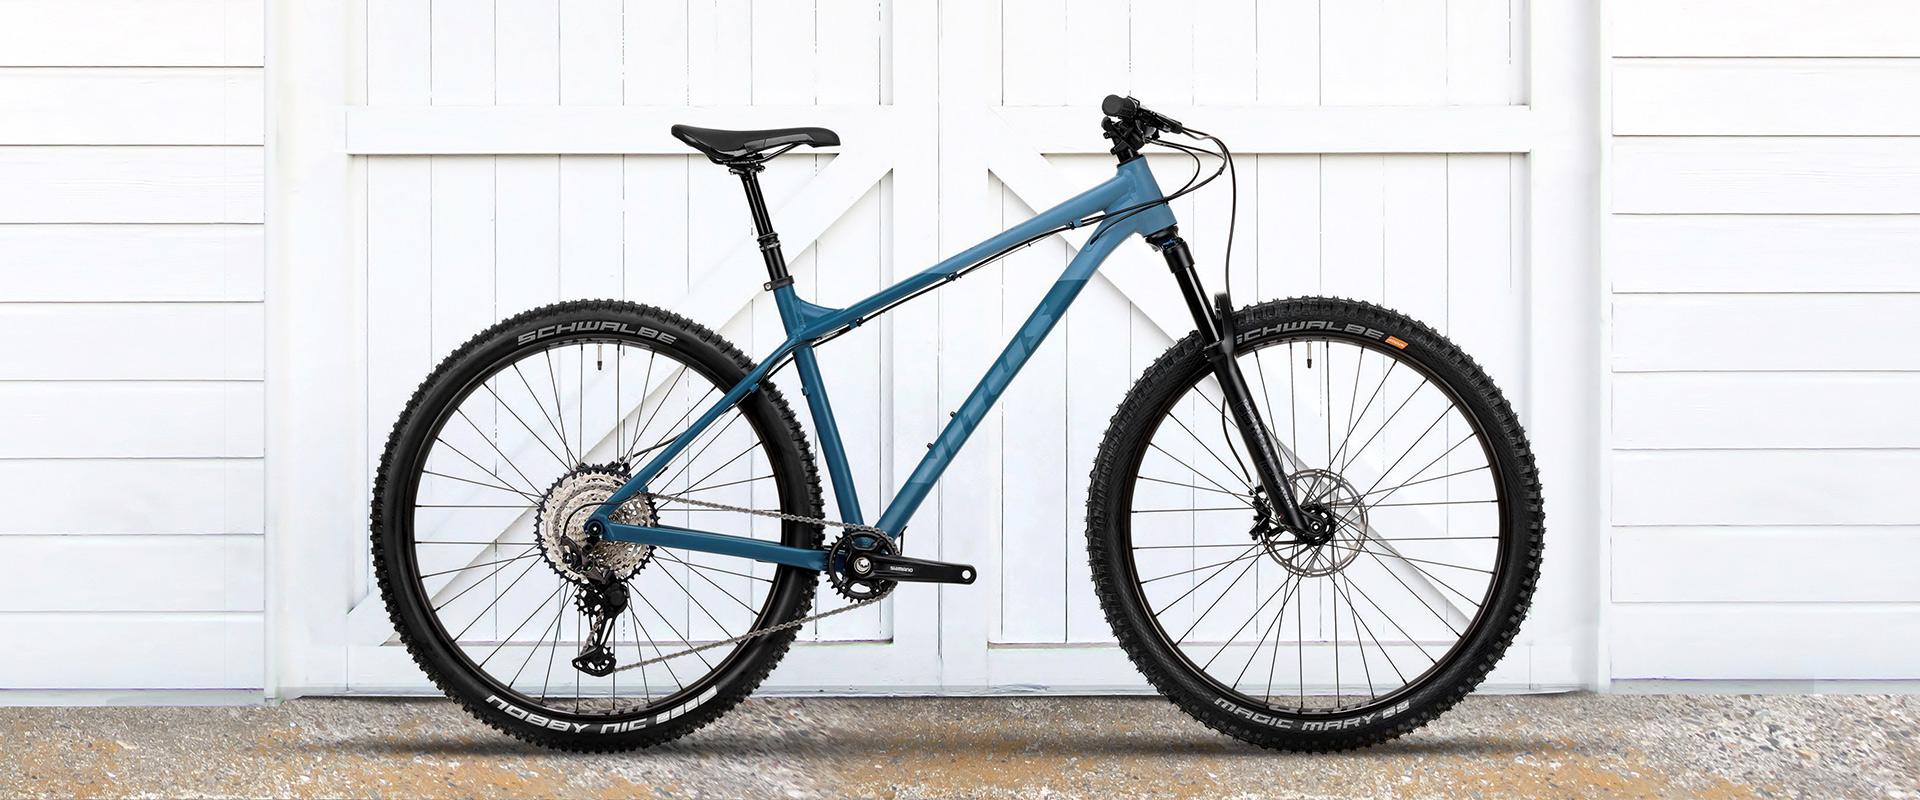 Sentier 29 VRS Bike XT SLX 1x12